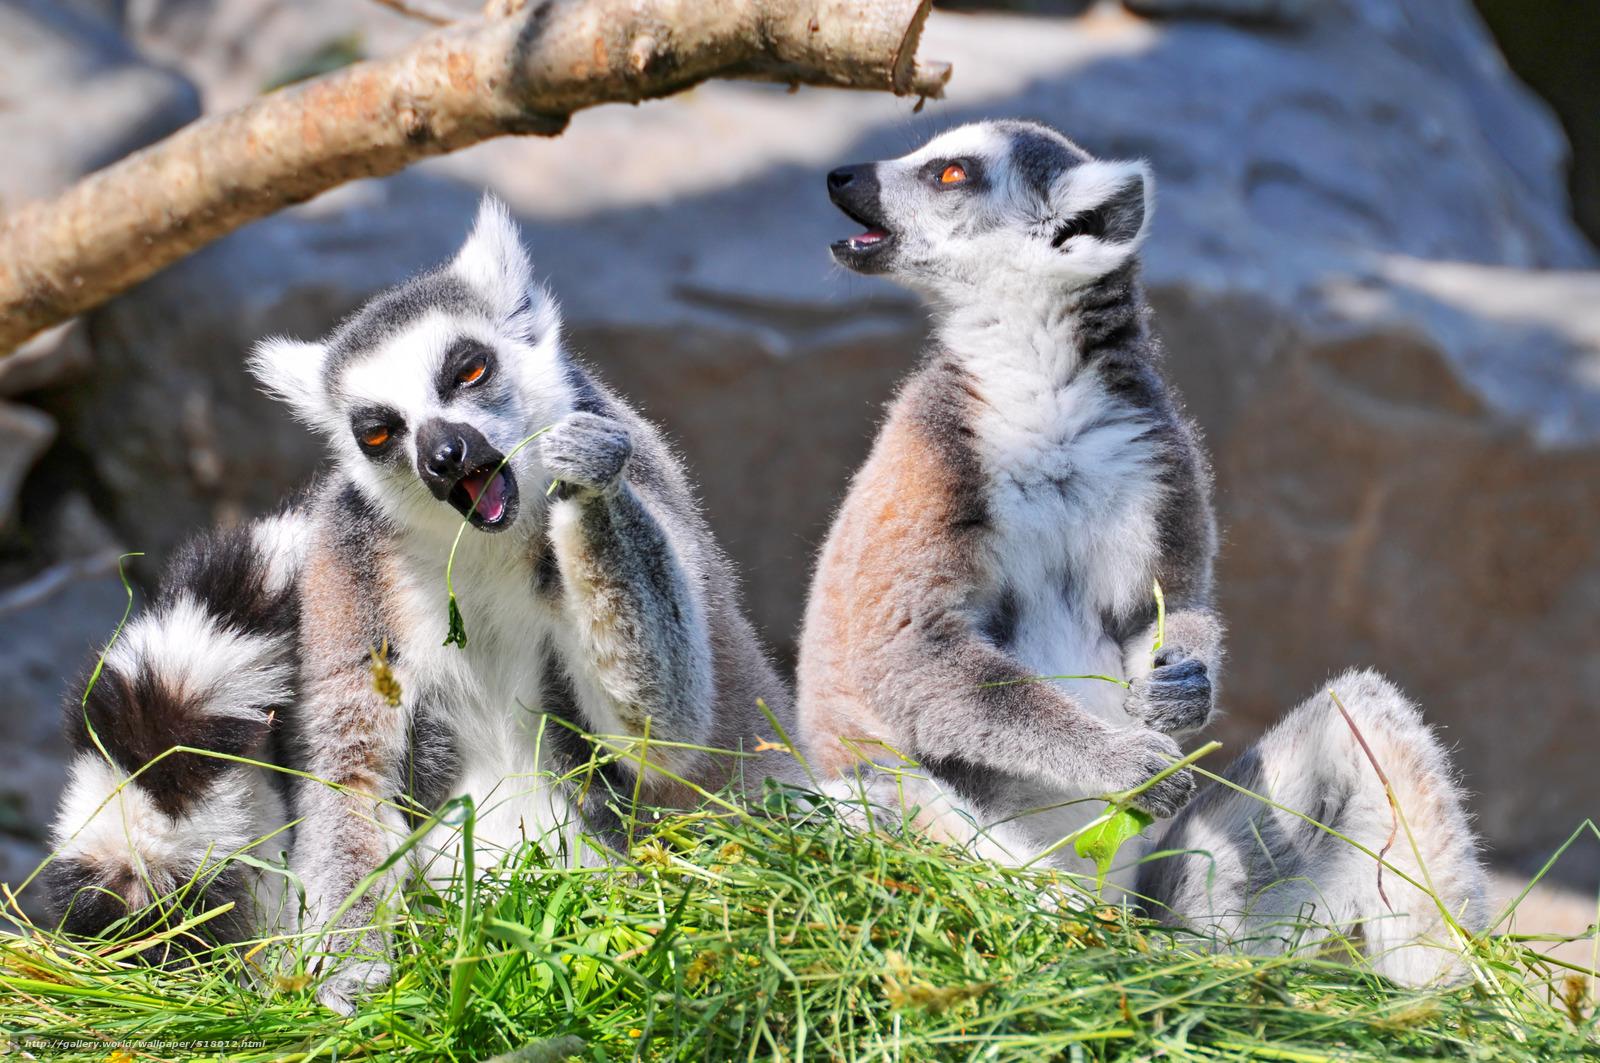 download wallpaper 3840x2160 lemur-#23